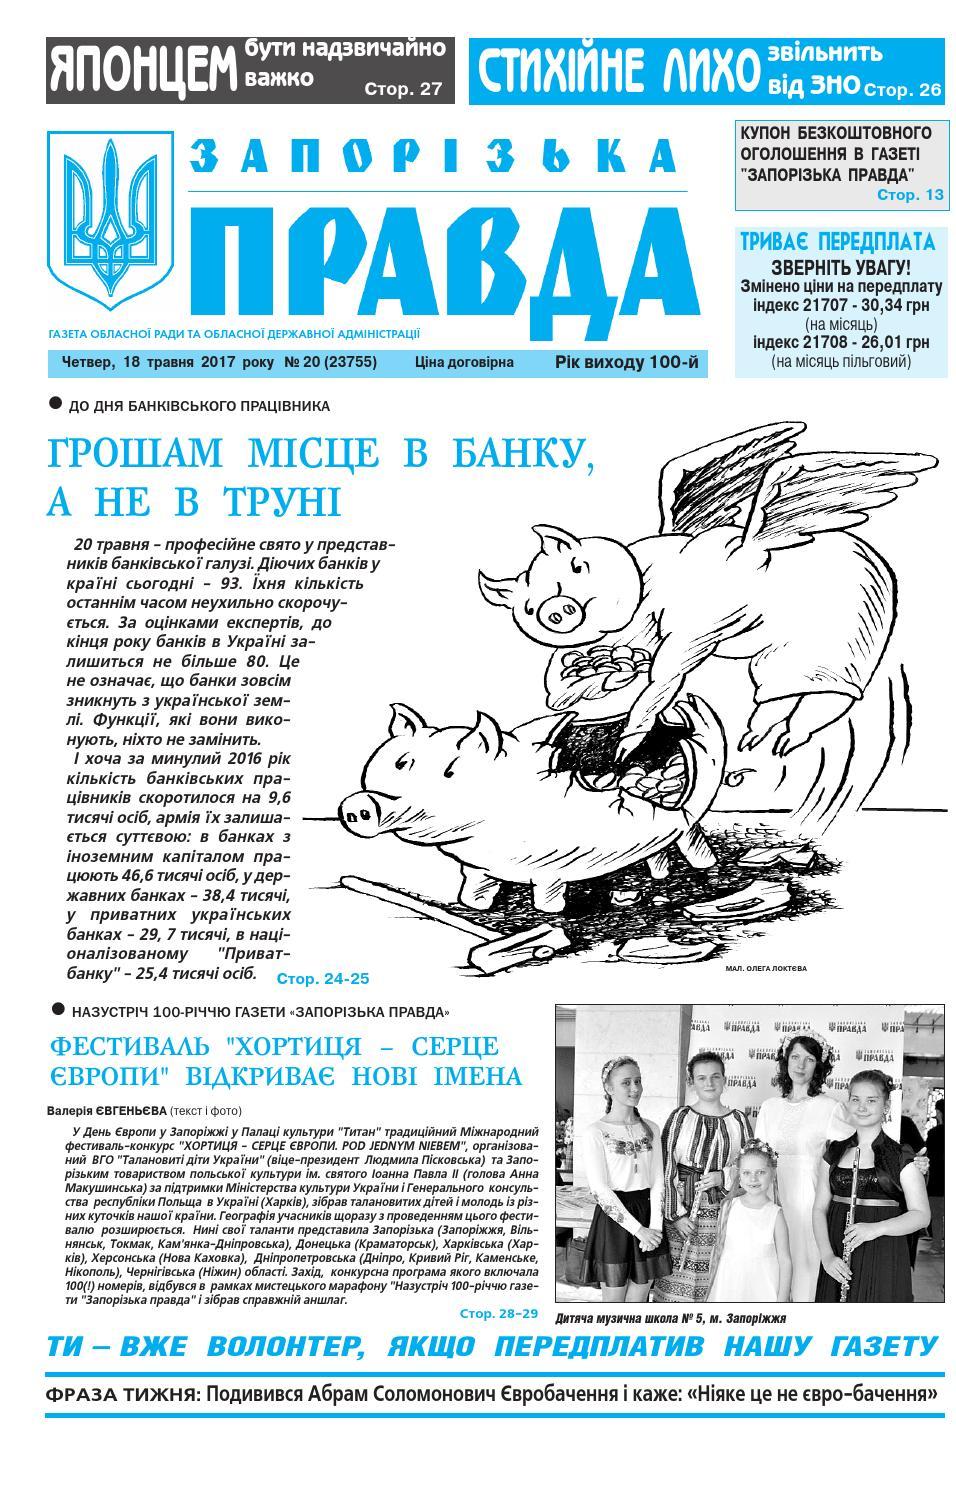 18 05 17 by Запорізька правда - issuu 71789c02b1279